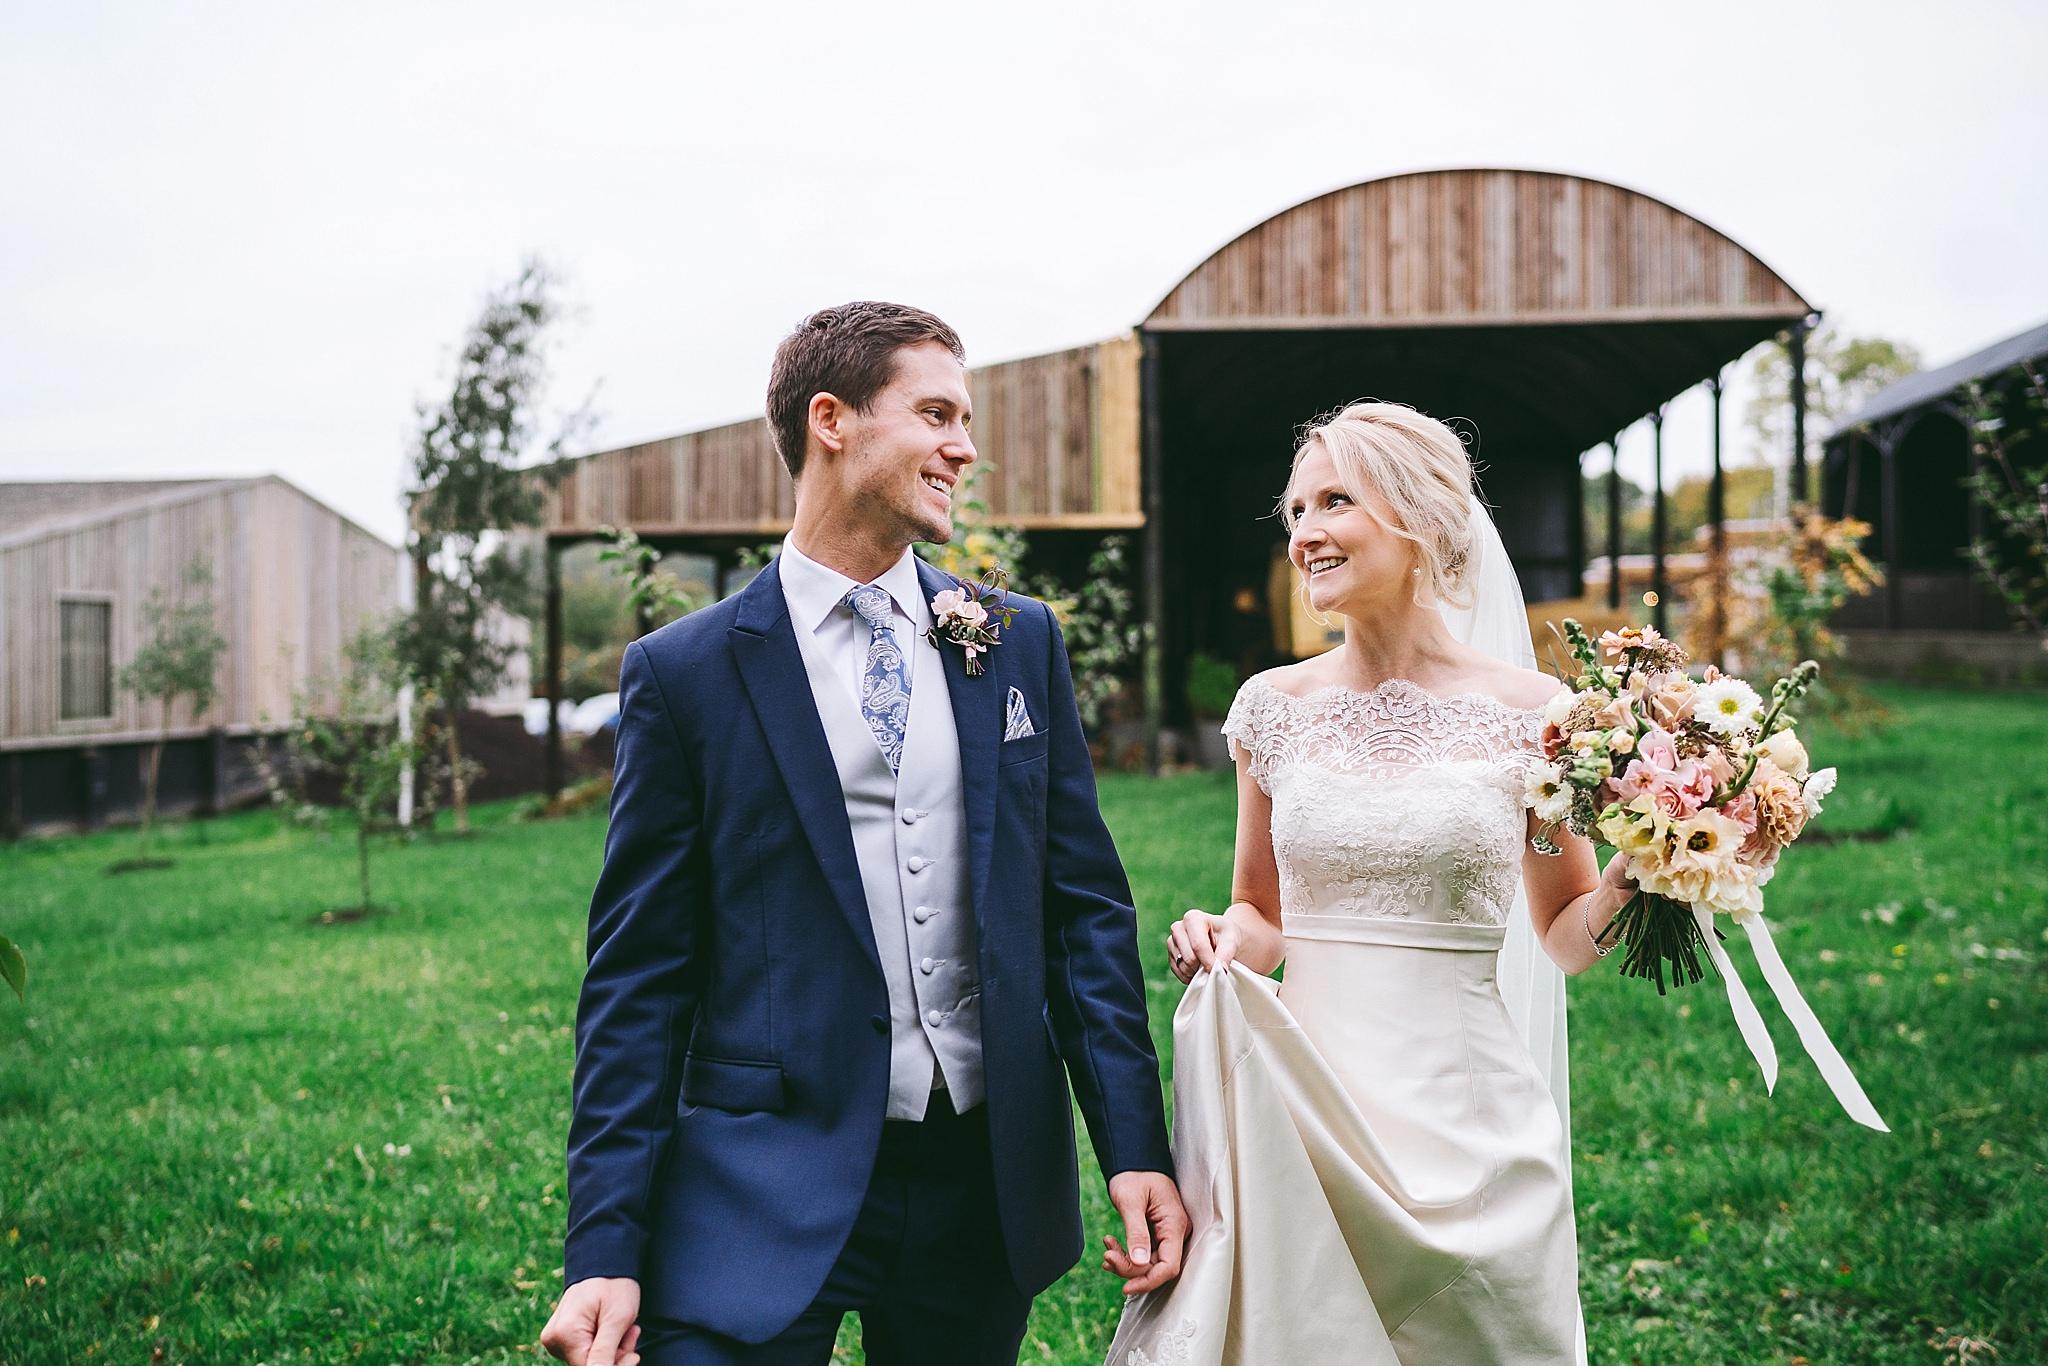 aga-tomaszek-wedding-photographer-cardiff-2016_1117